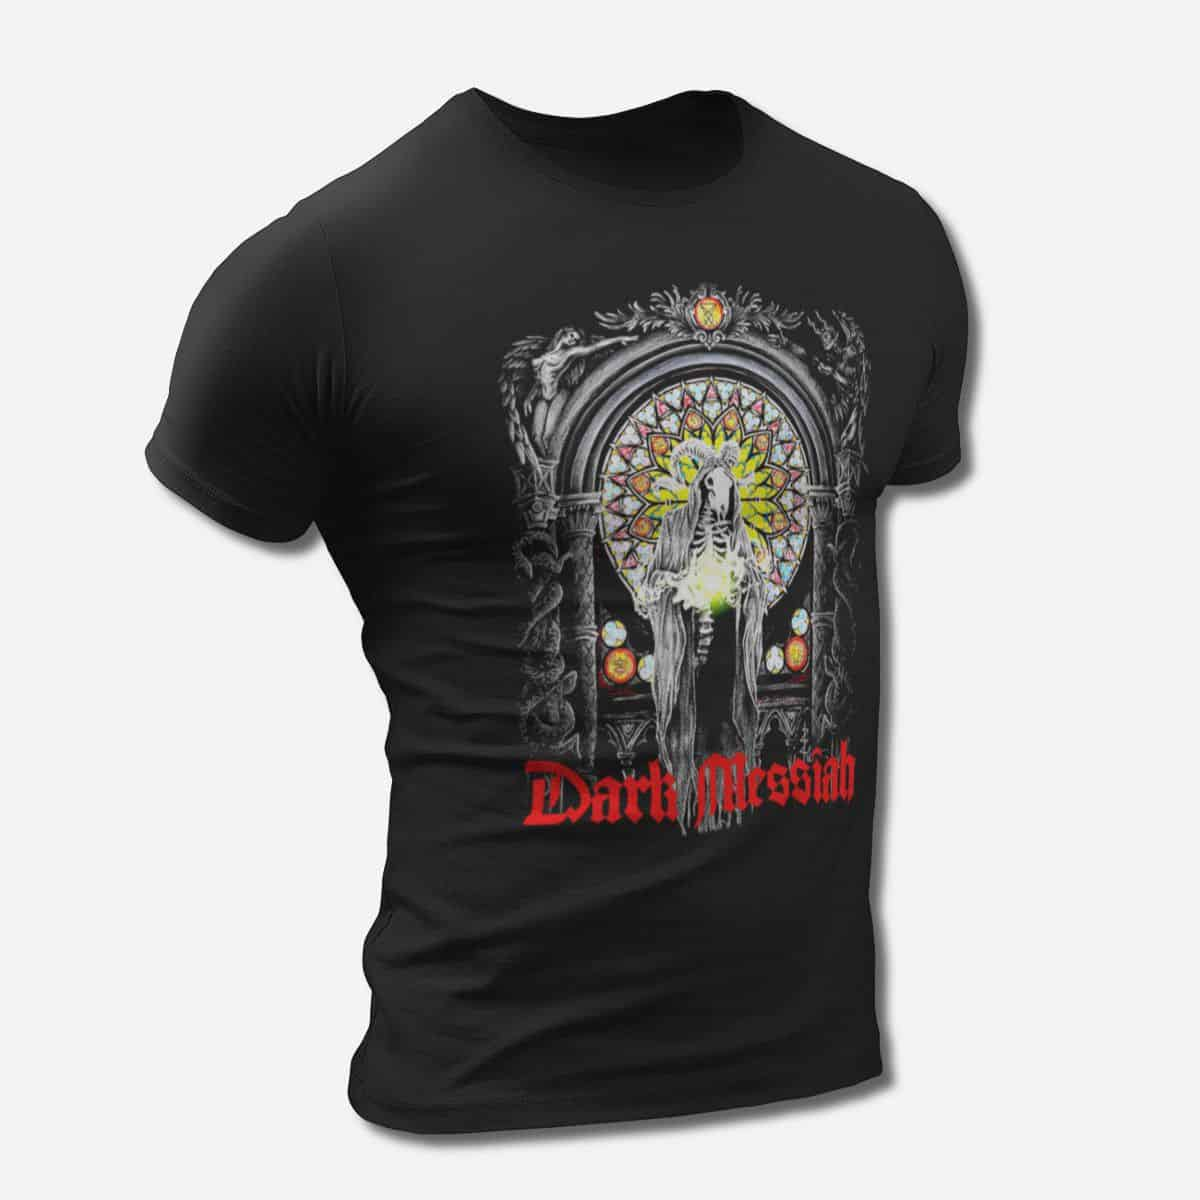 c8405da7a6474 Dark Messiah Band T-Shirt, Dark Messiah Artwork Tee Shirt, Thrash Metal,  Groove Metal Merch